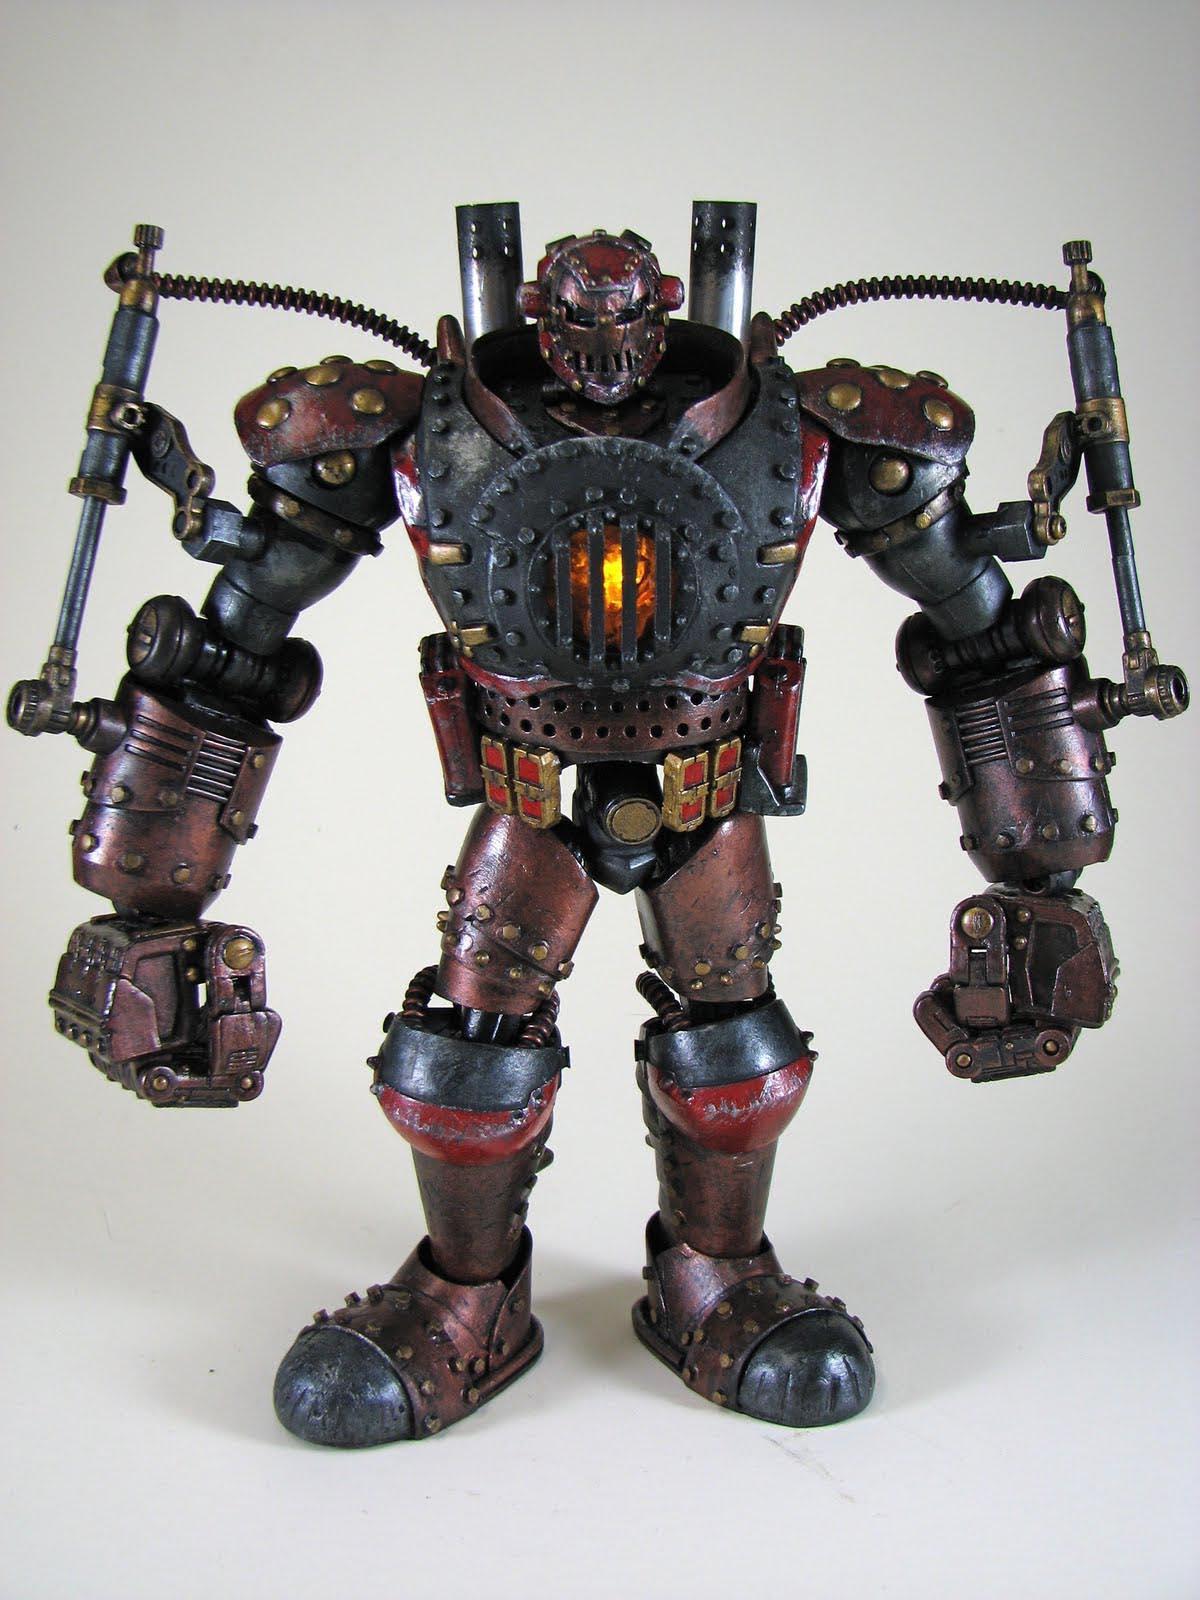 Steampunk Iron Man Custom Action Figure Gadgetsin